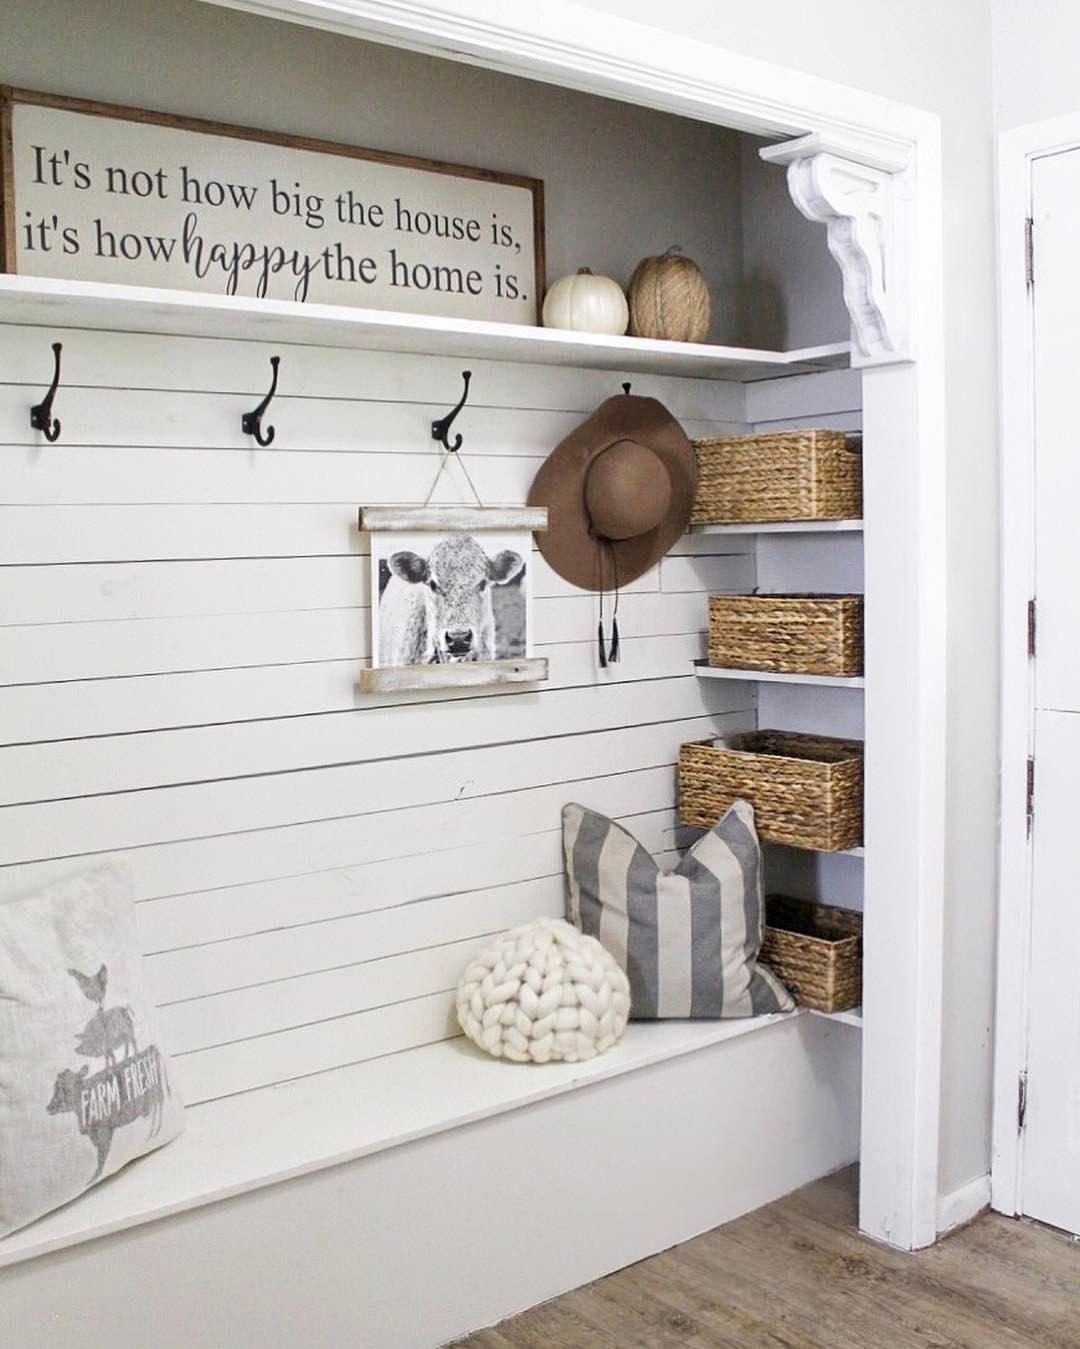 Awake Home Furniture Quotes #home #FurnitureLivingRoomContemporary